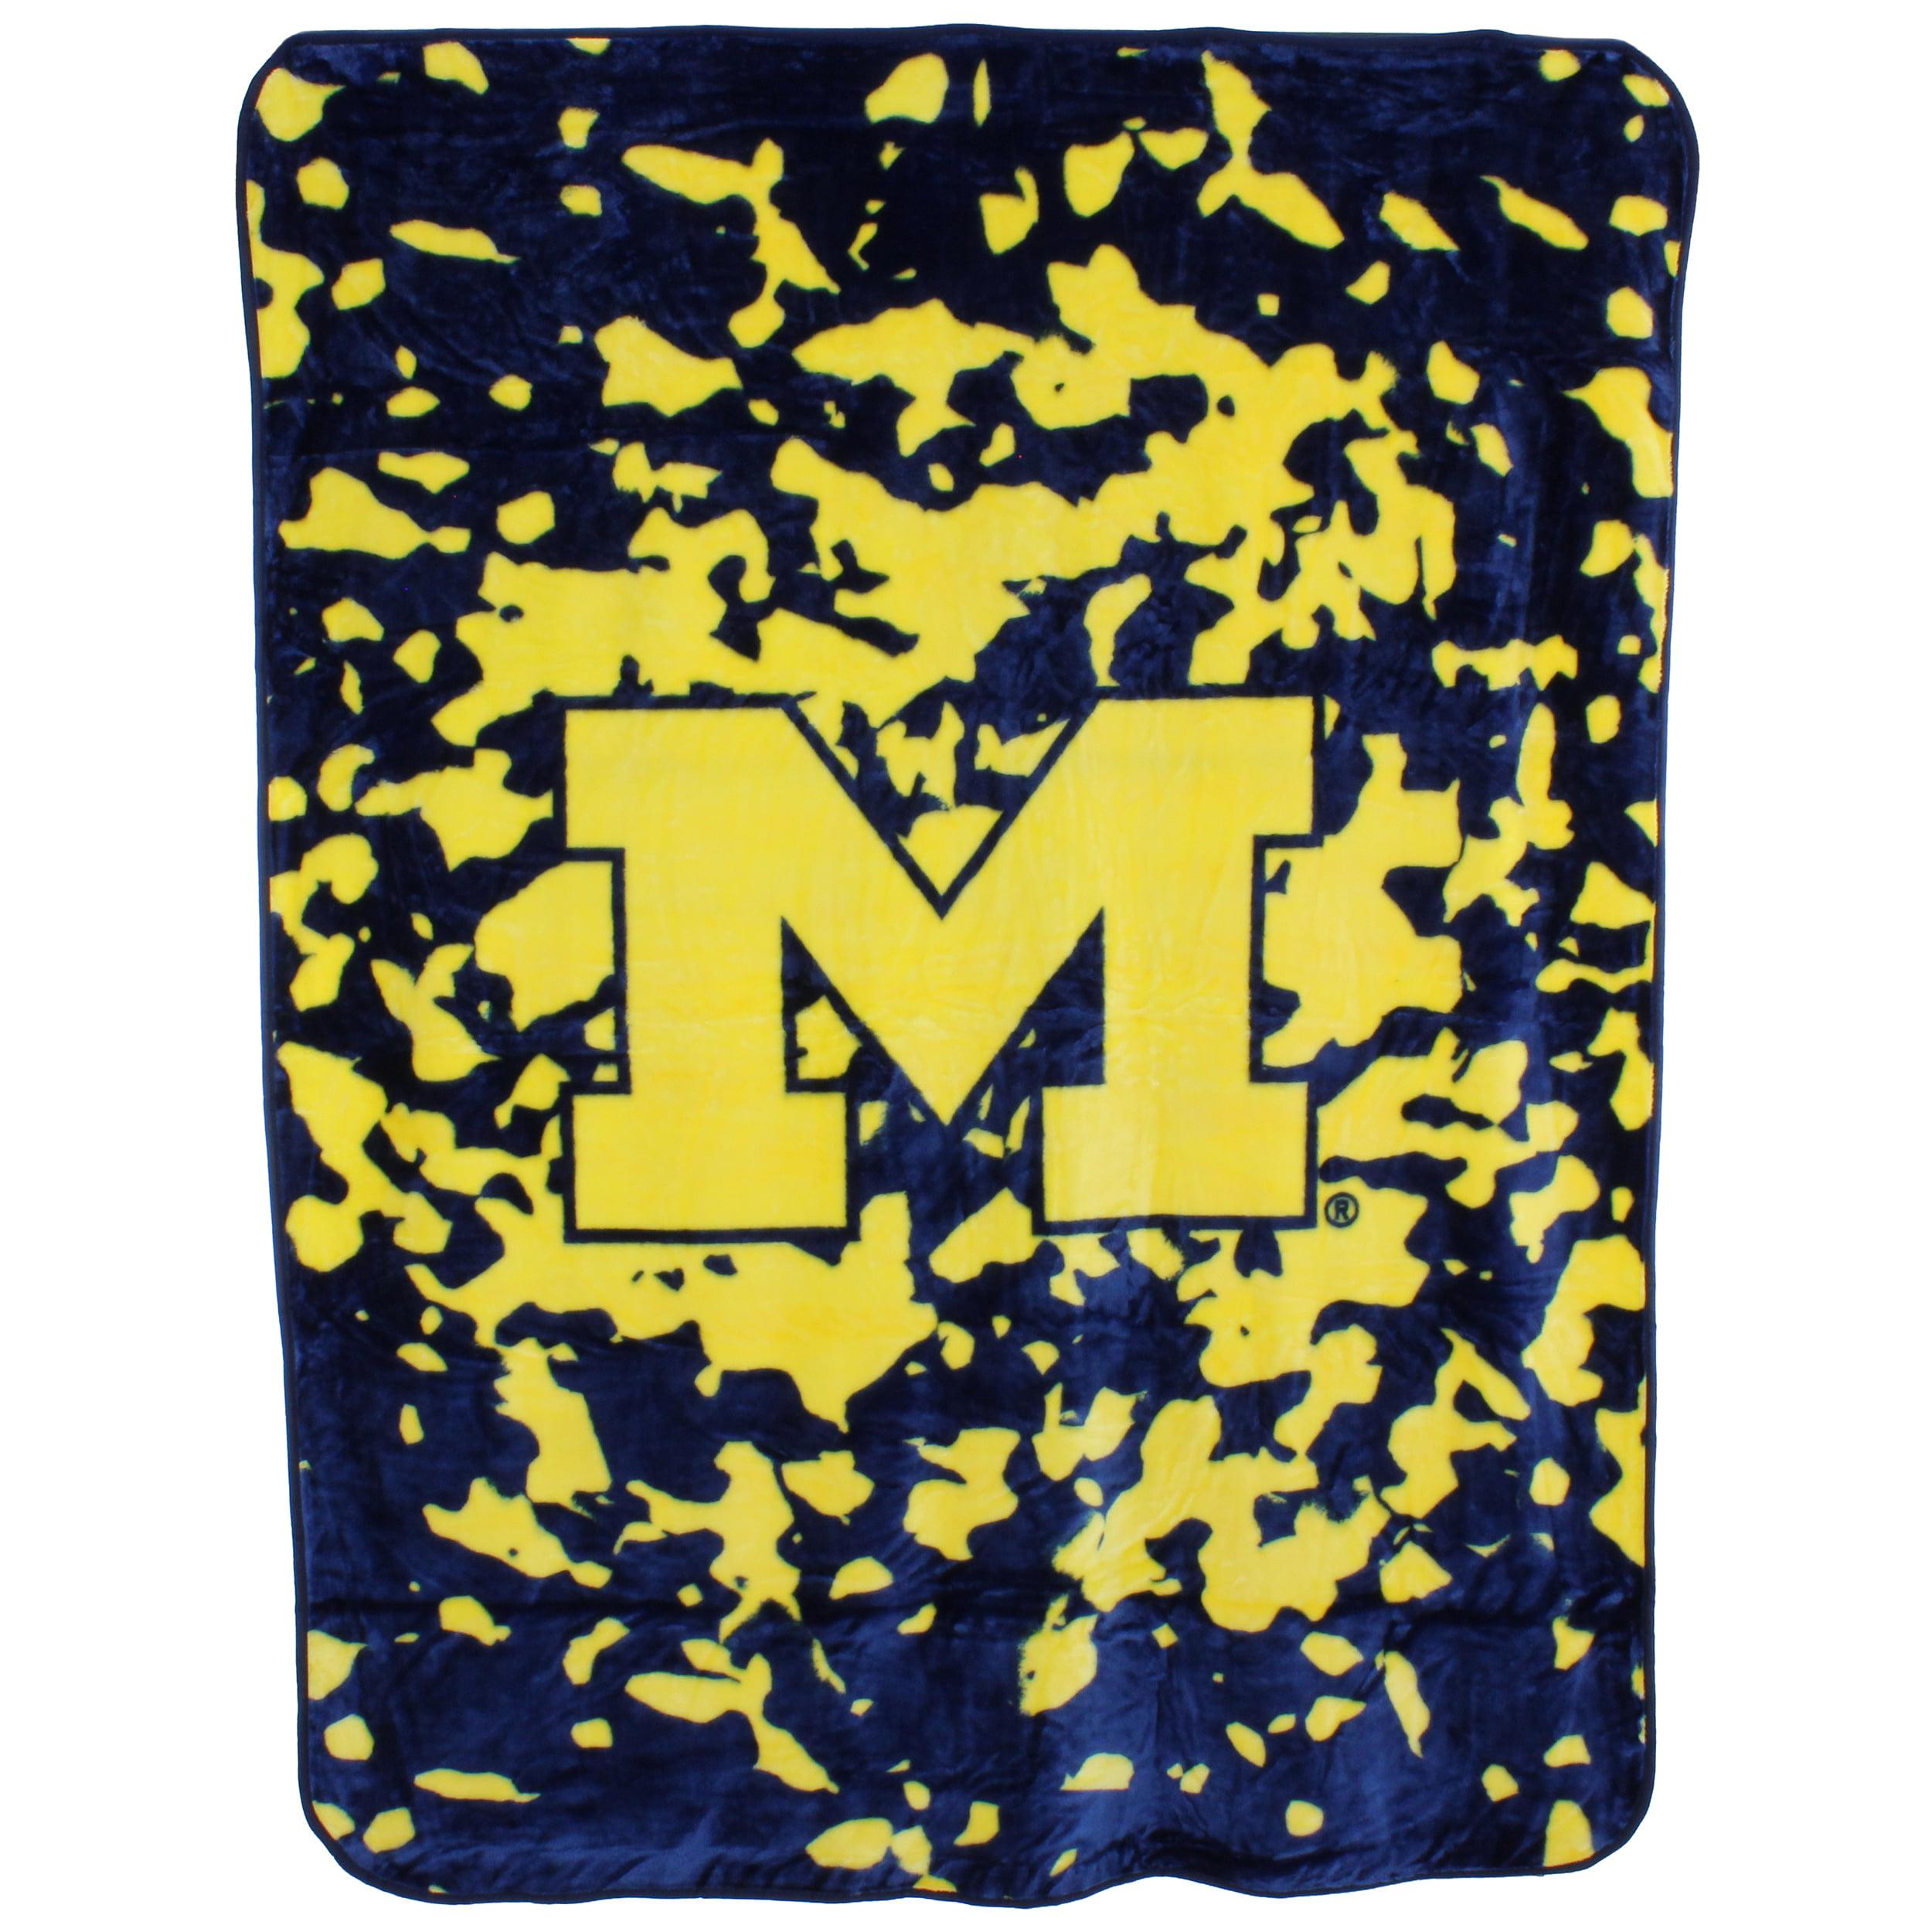 "College Covers Fan Shop Throws Michigan Wolverines 63"" x 86"" Soft Raschel Throw Blanket"